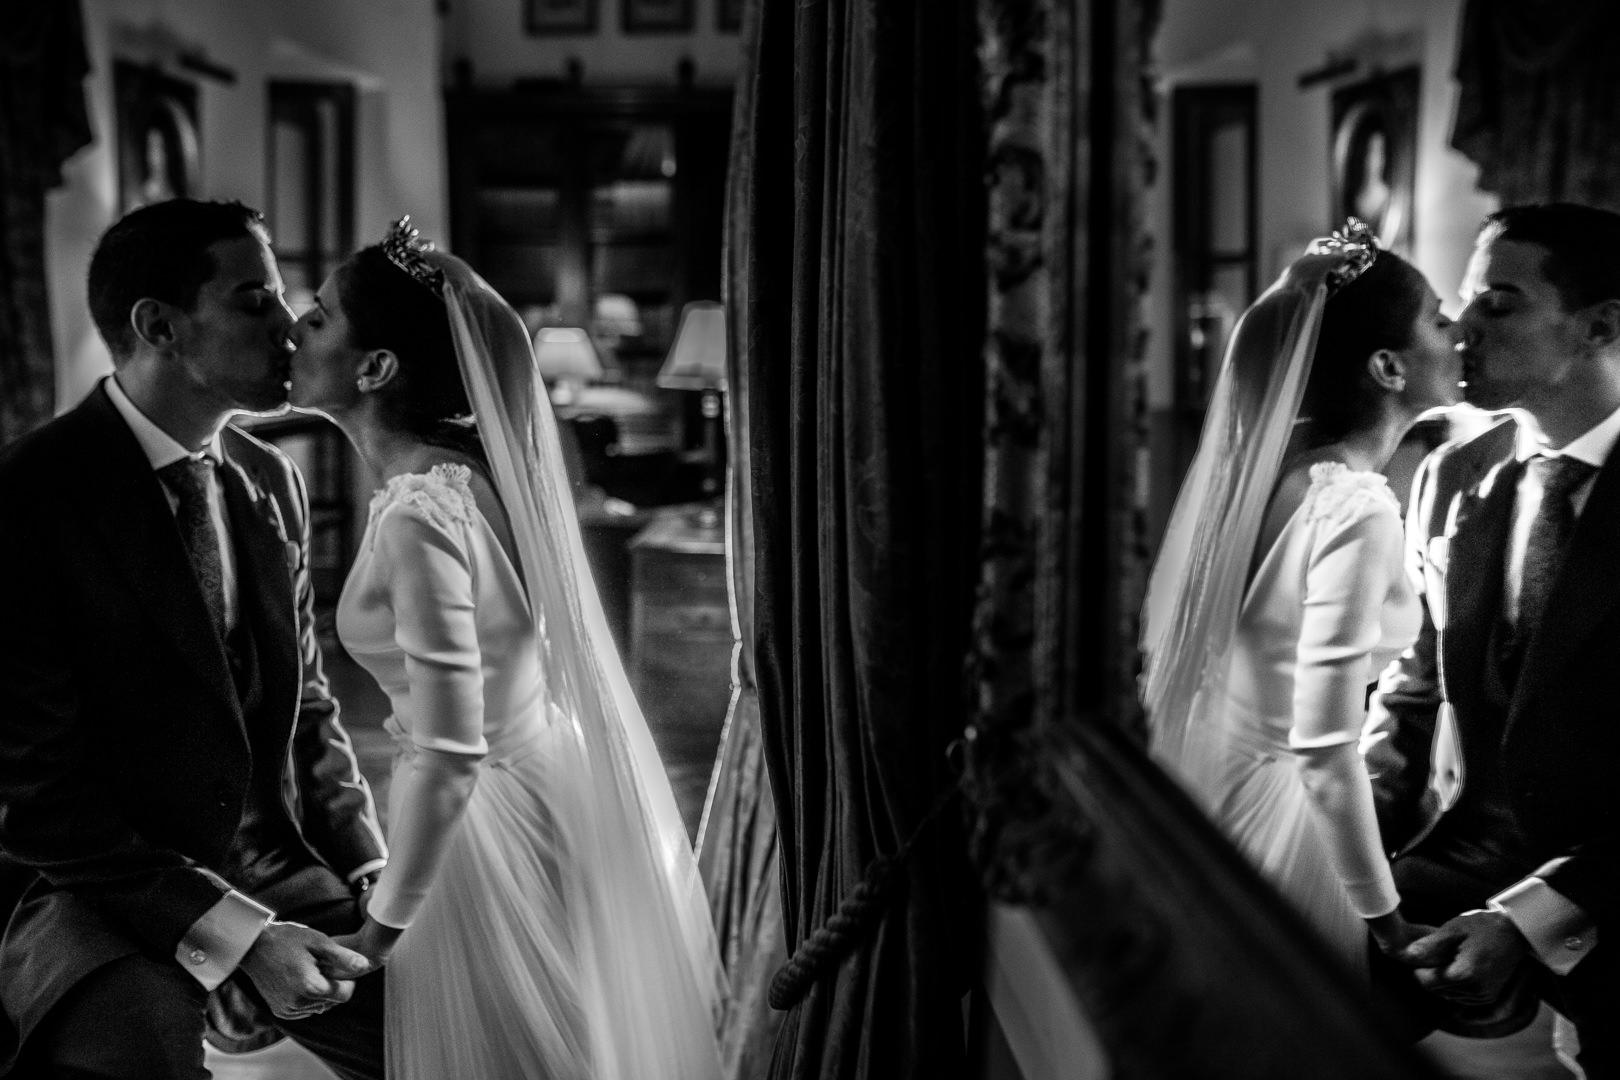 Boda-sevilla-Wedding-engagement-Rafael-Torres-fotografo-bodas-sevilla-madrid-barcelona-wedding-photographer--45.jpg